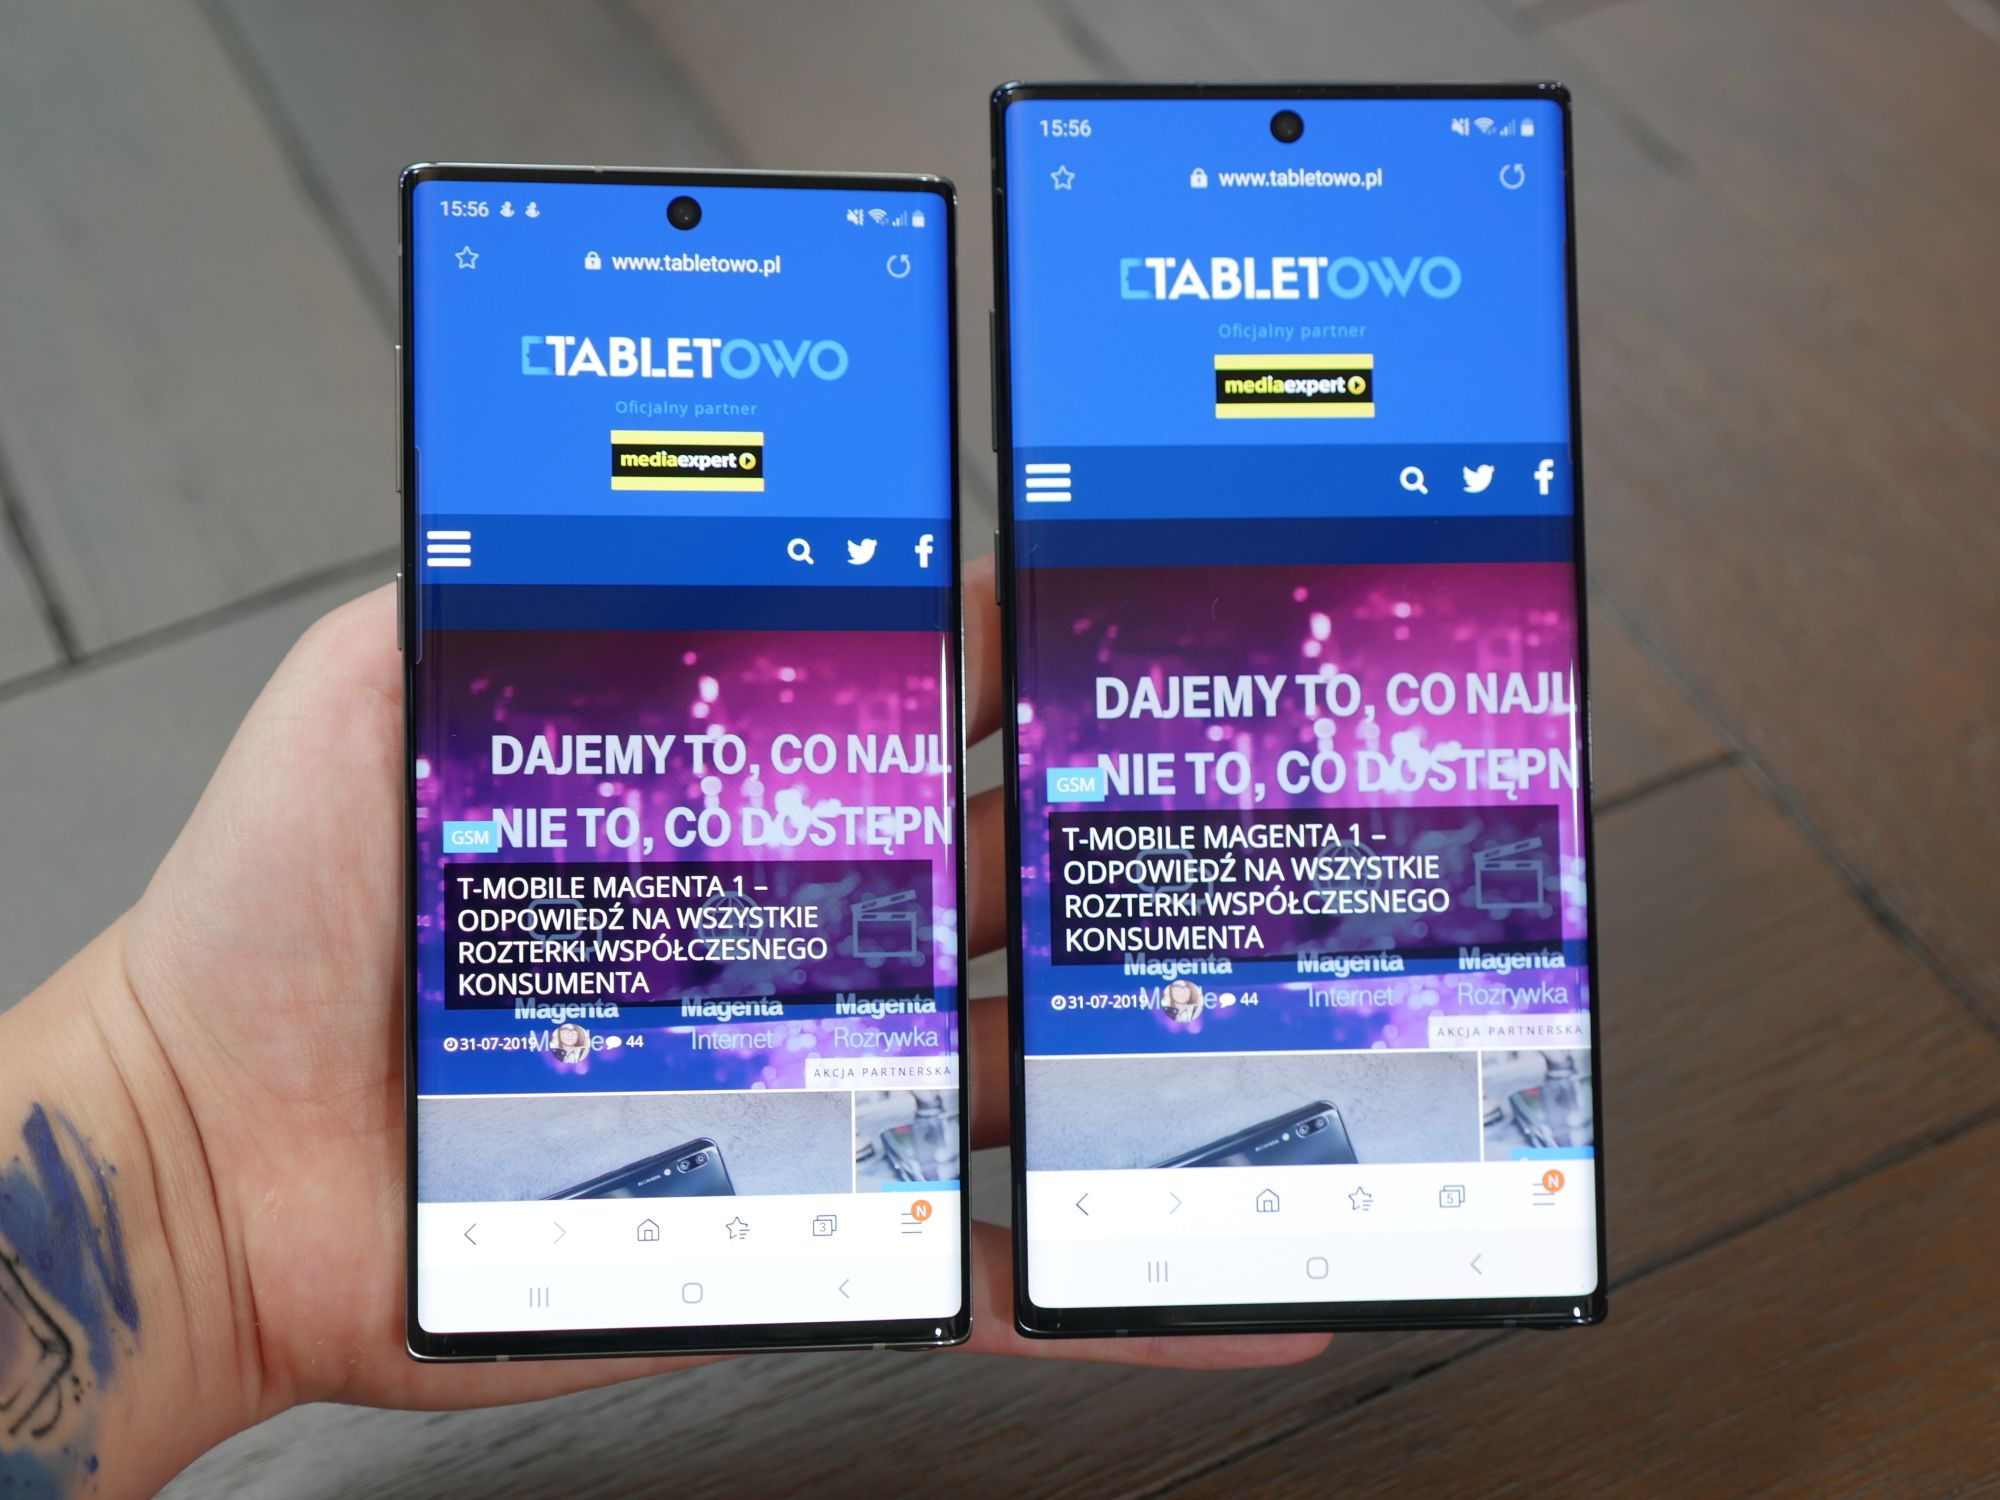 smartfony Samsung Galaxy Note 10 i Galaxy Note 10+